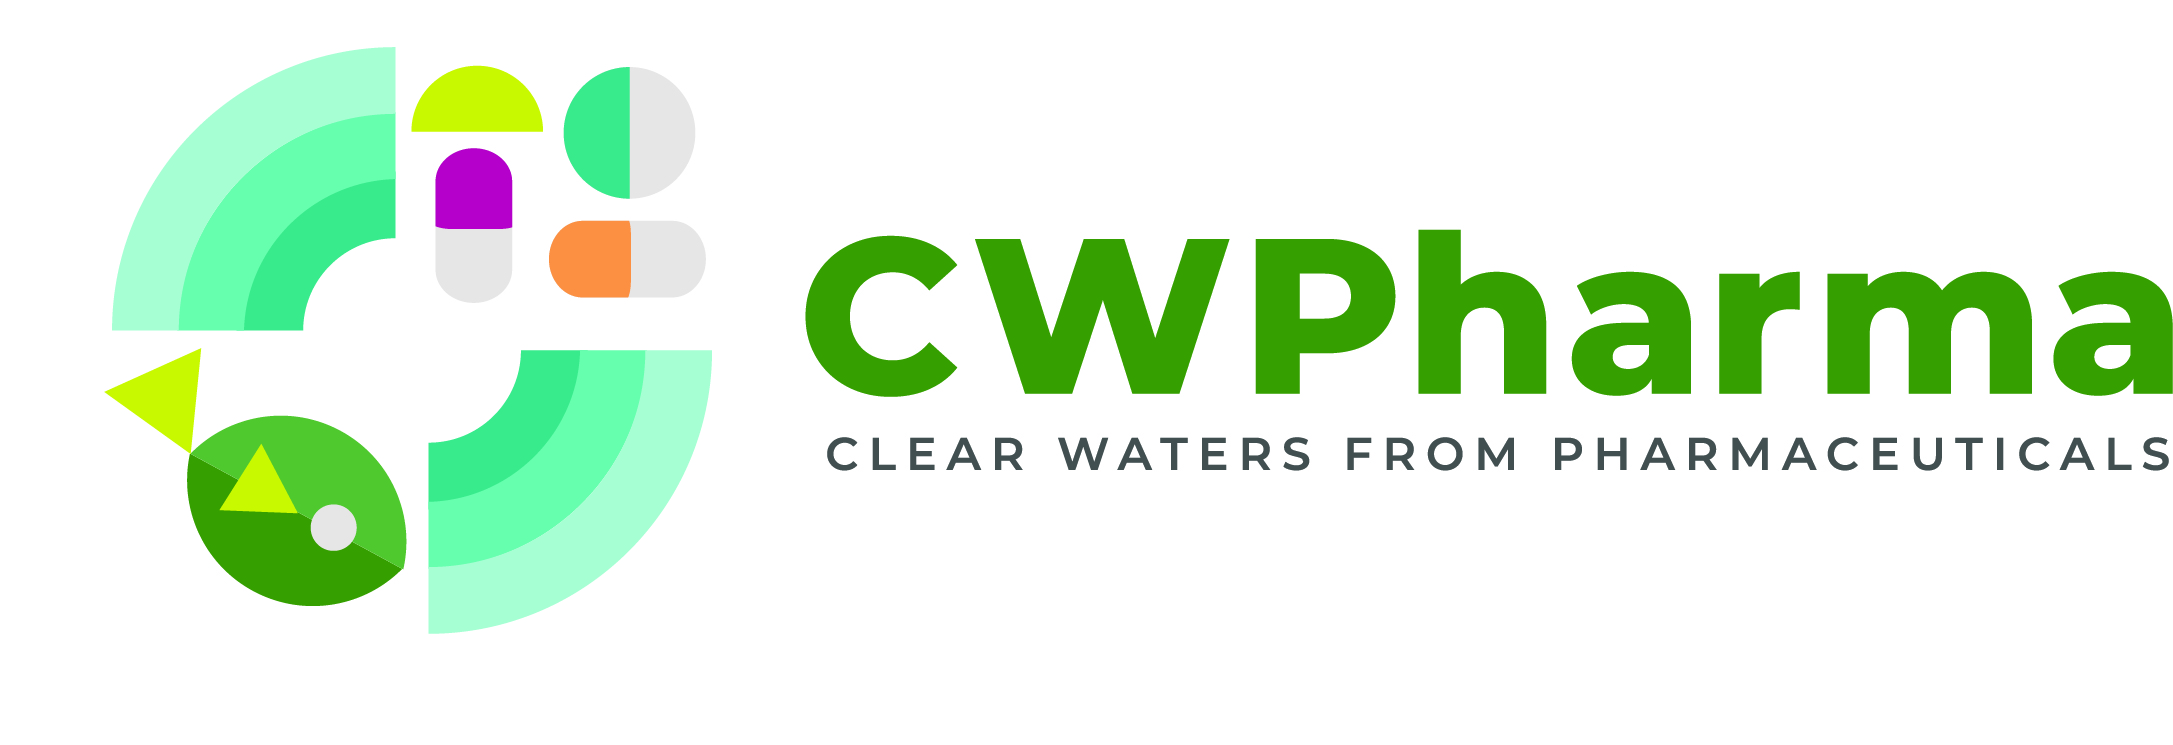 SWPharma logo